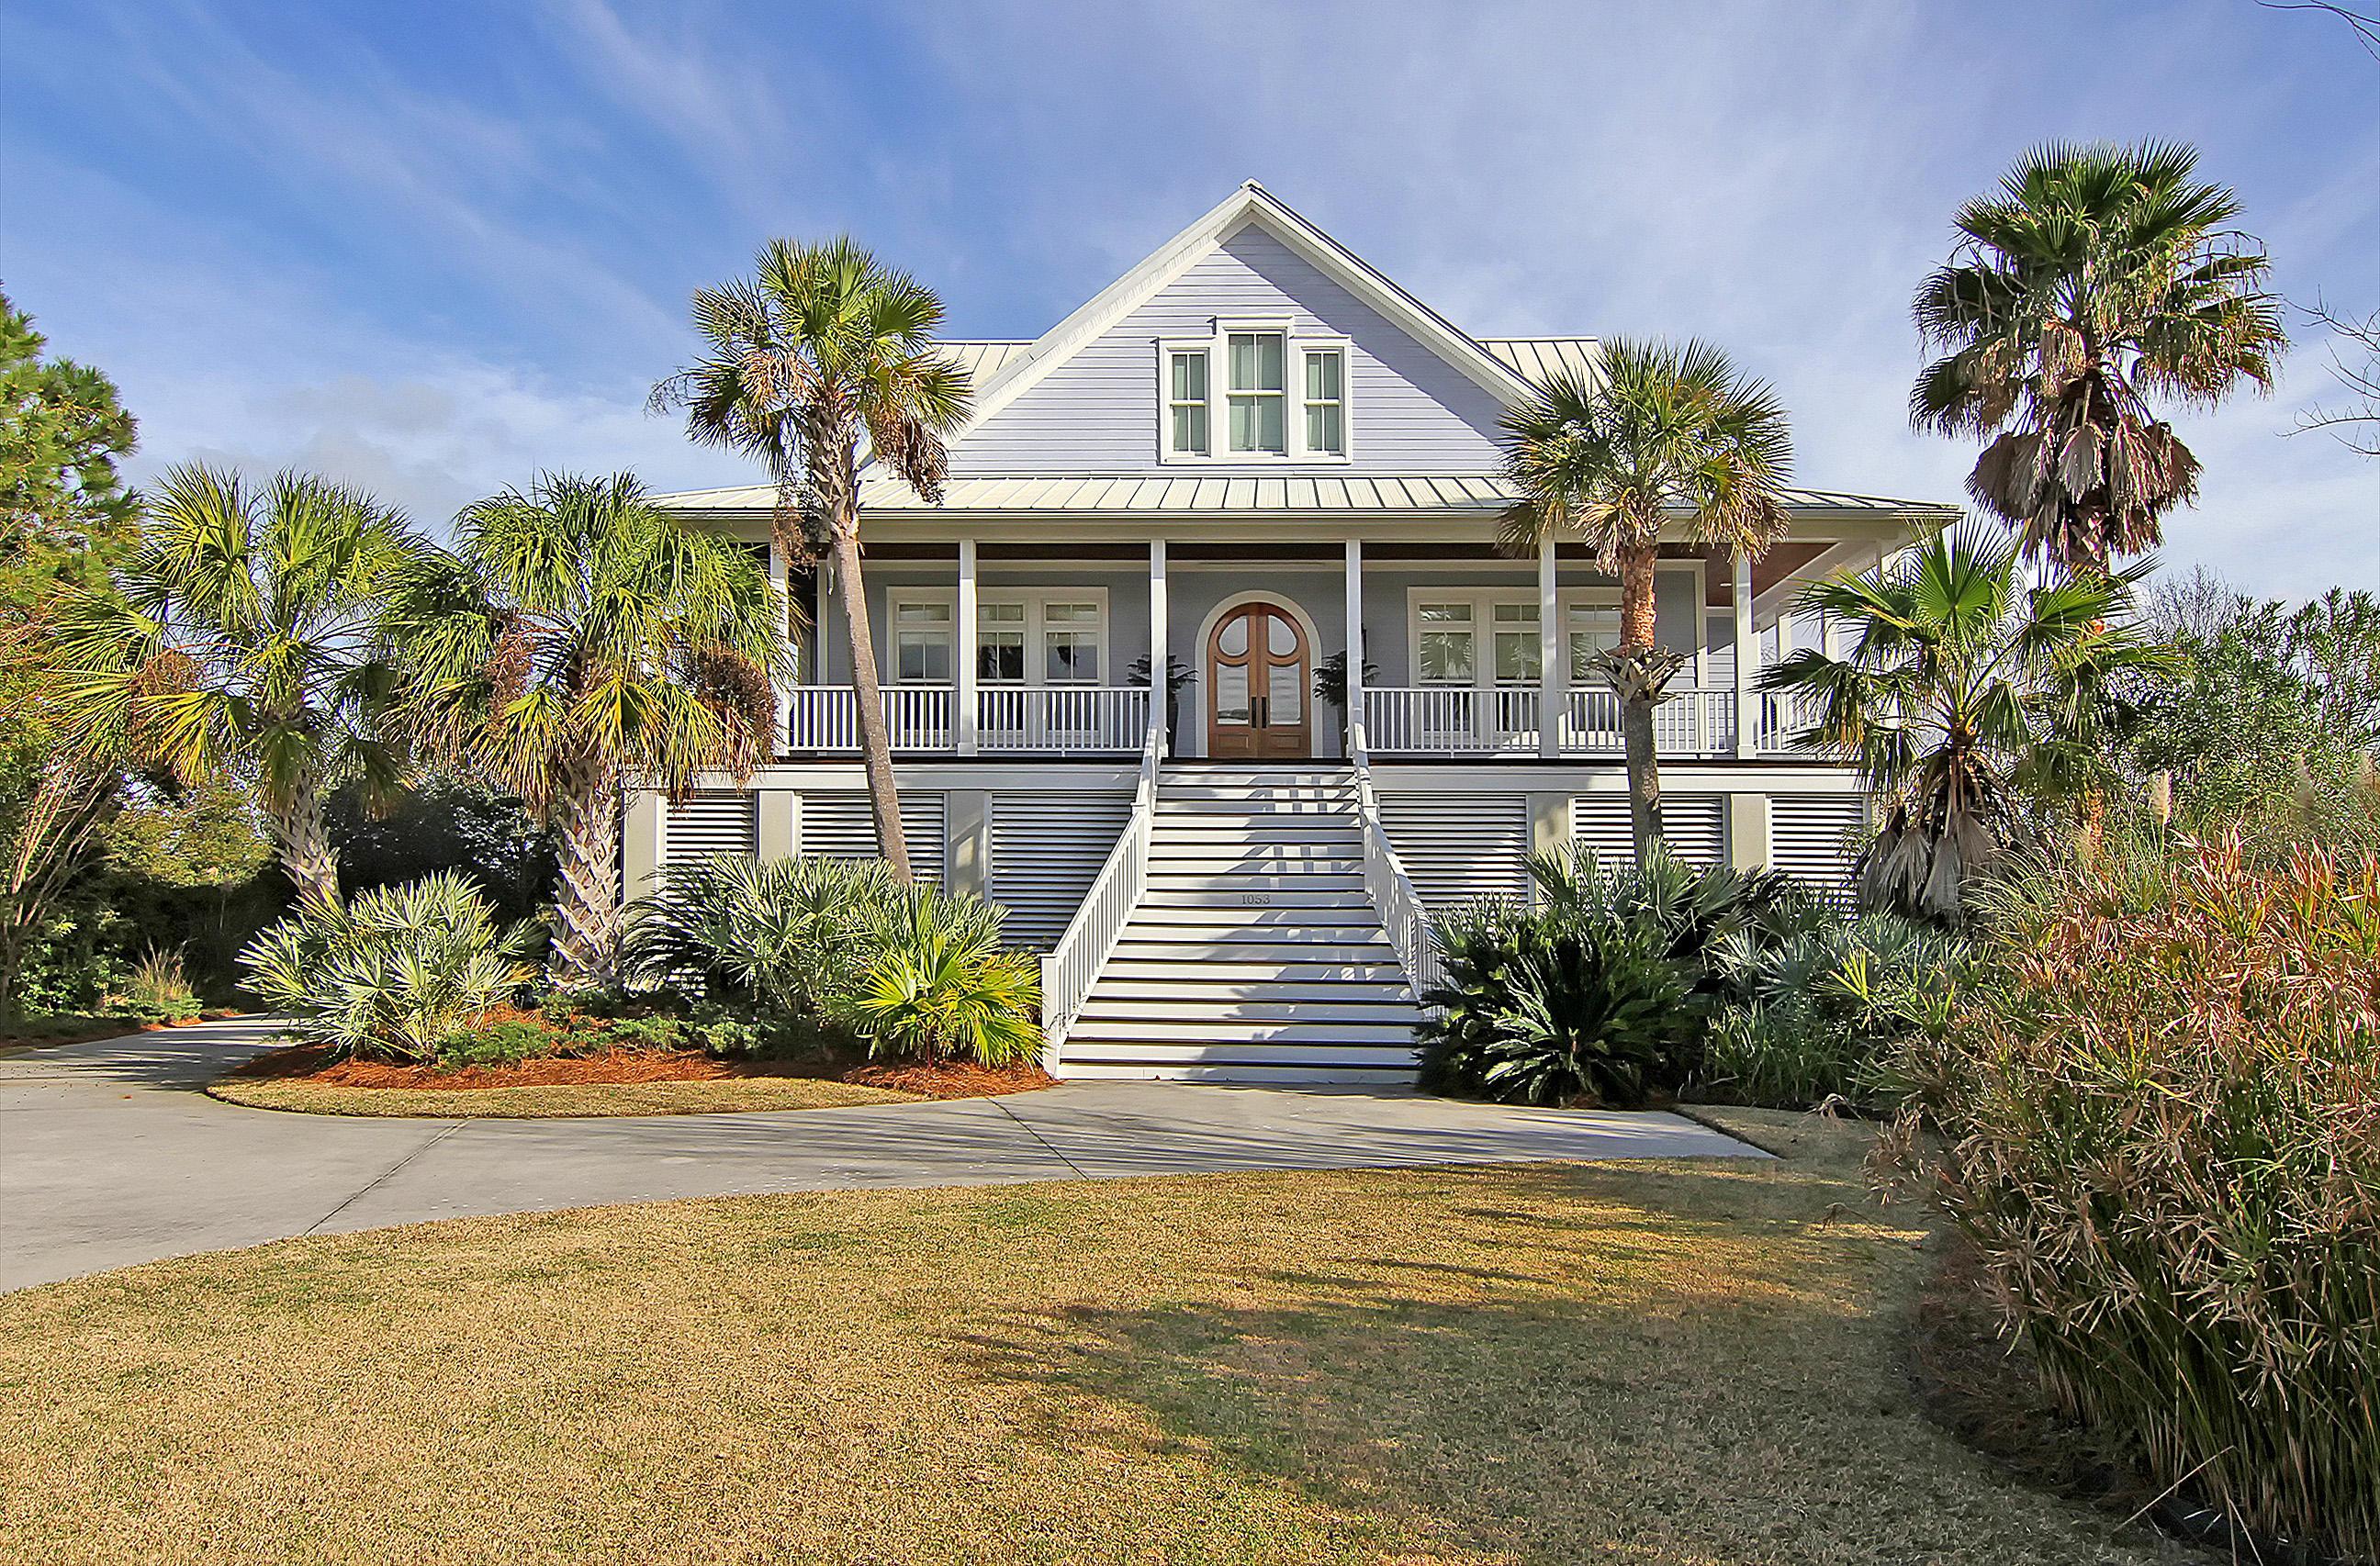 Beresford Creek Landing Homes For Sale - 1053 Rivershore, Charleston, SC - 0